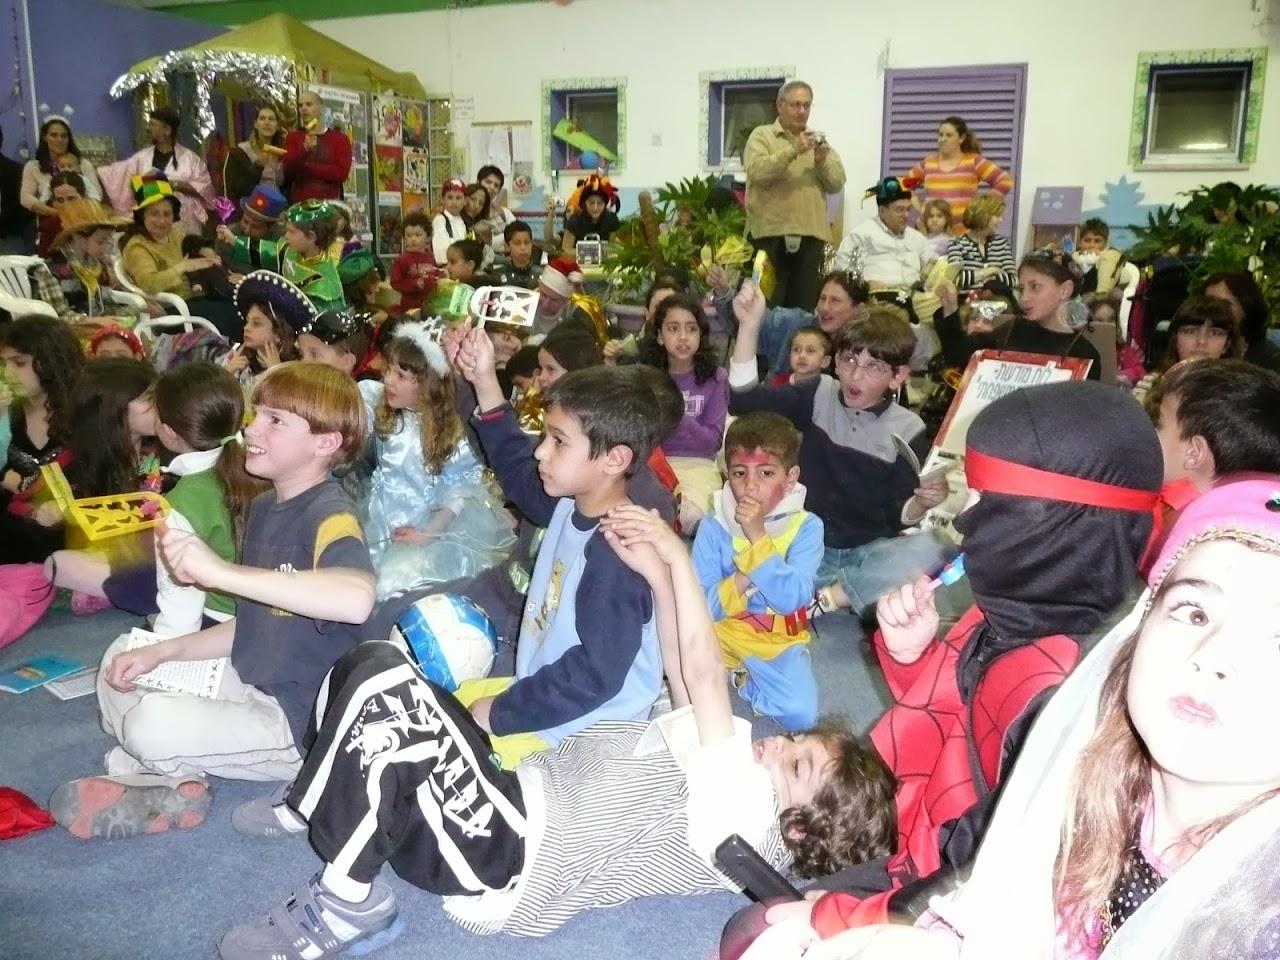 Purim 2008  - 2008-03-20 18.55.44-3.jpg